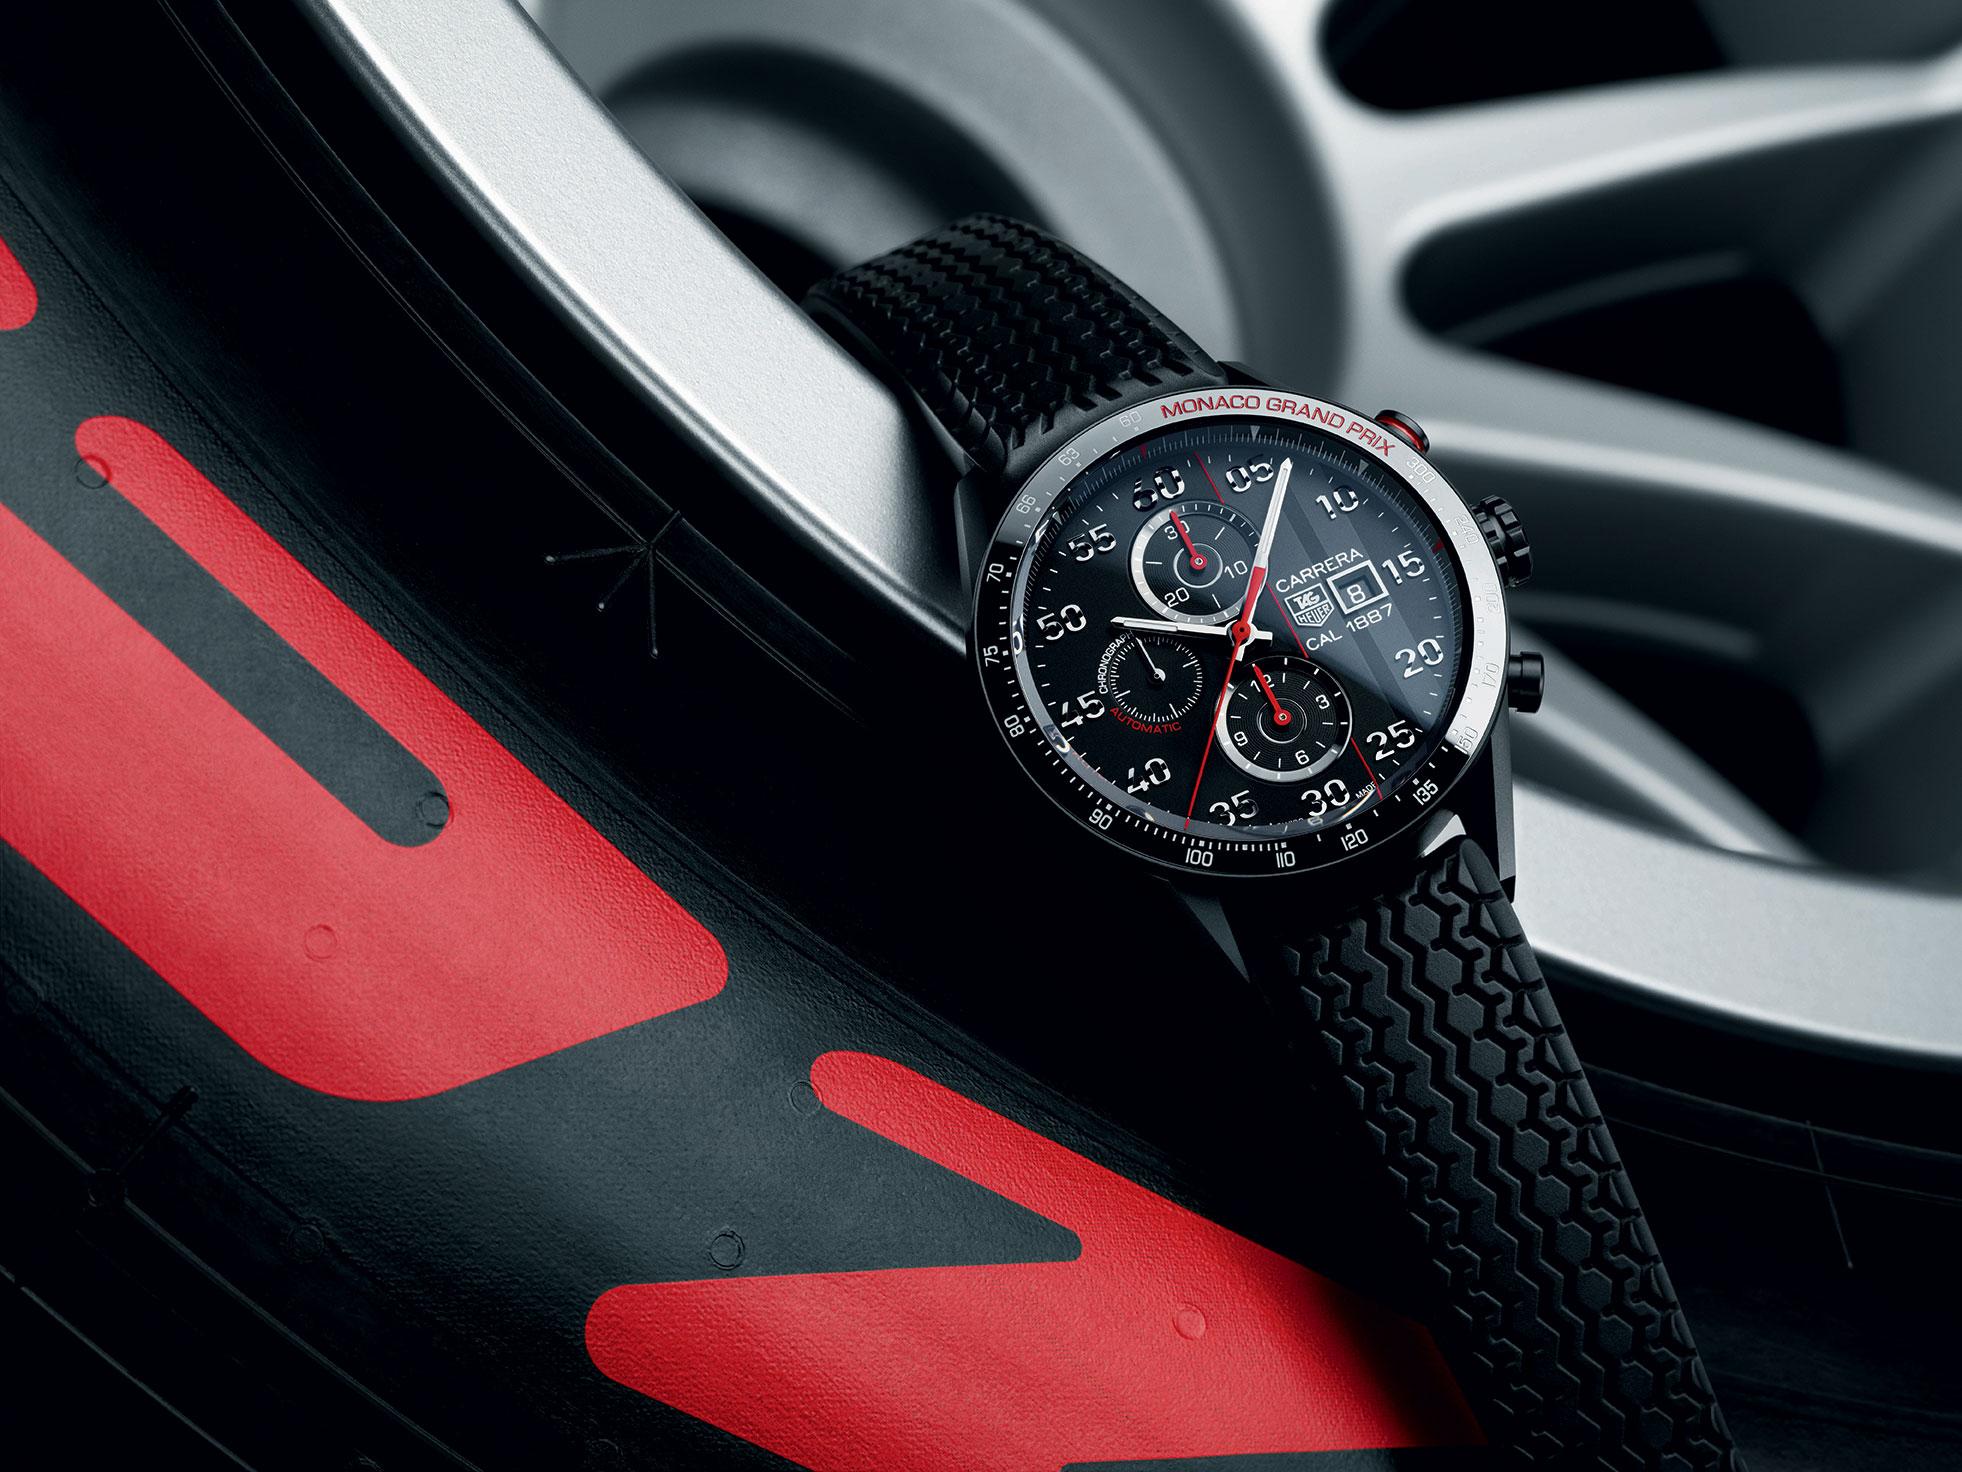 Naziv: 2014-TAG-Heuer-Carrera-1887-Monaco-Grand-Prix-Edition-watches-satovi-2.jpg, pregleda: 715, veličina: 426,7 KB